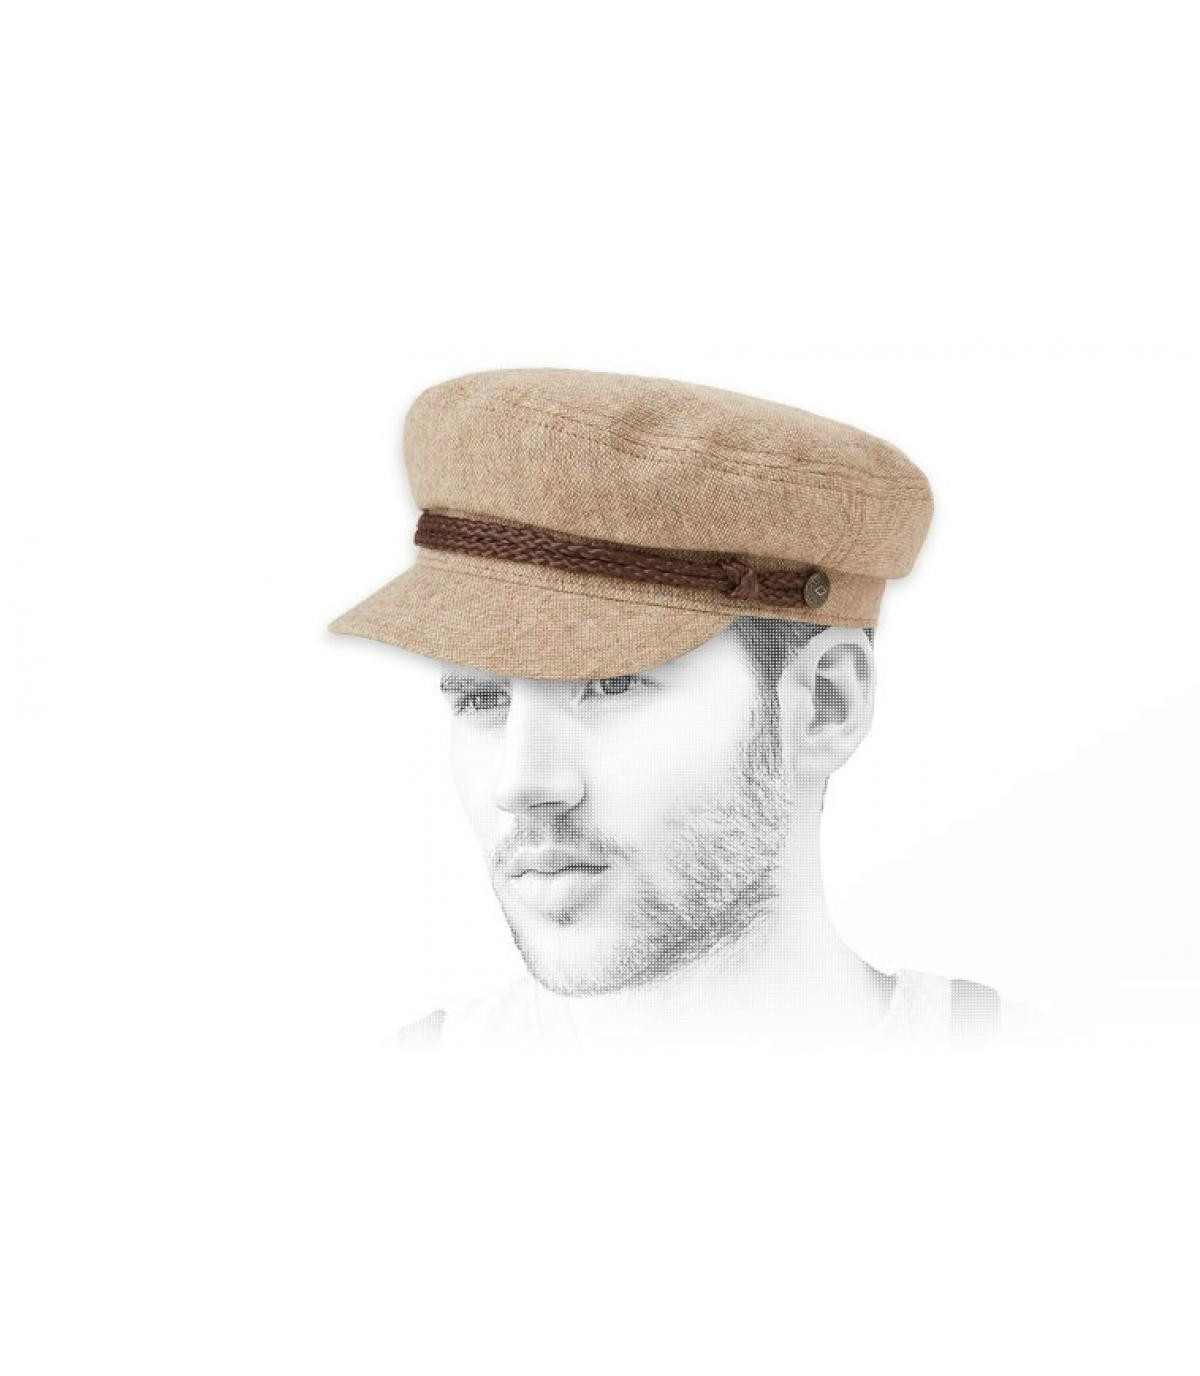 beige sailcap